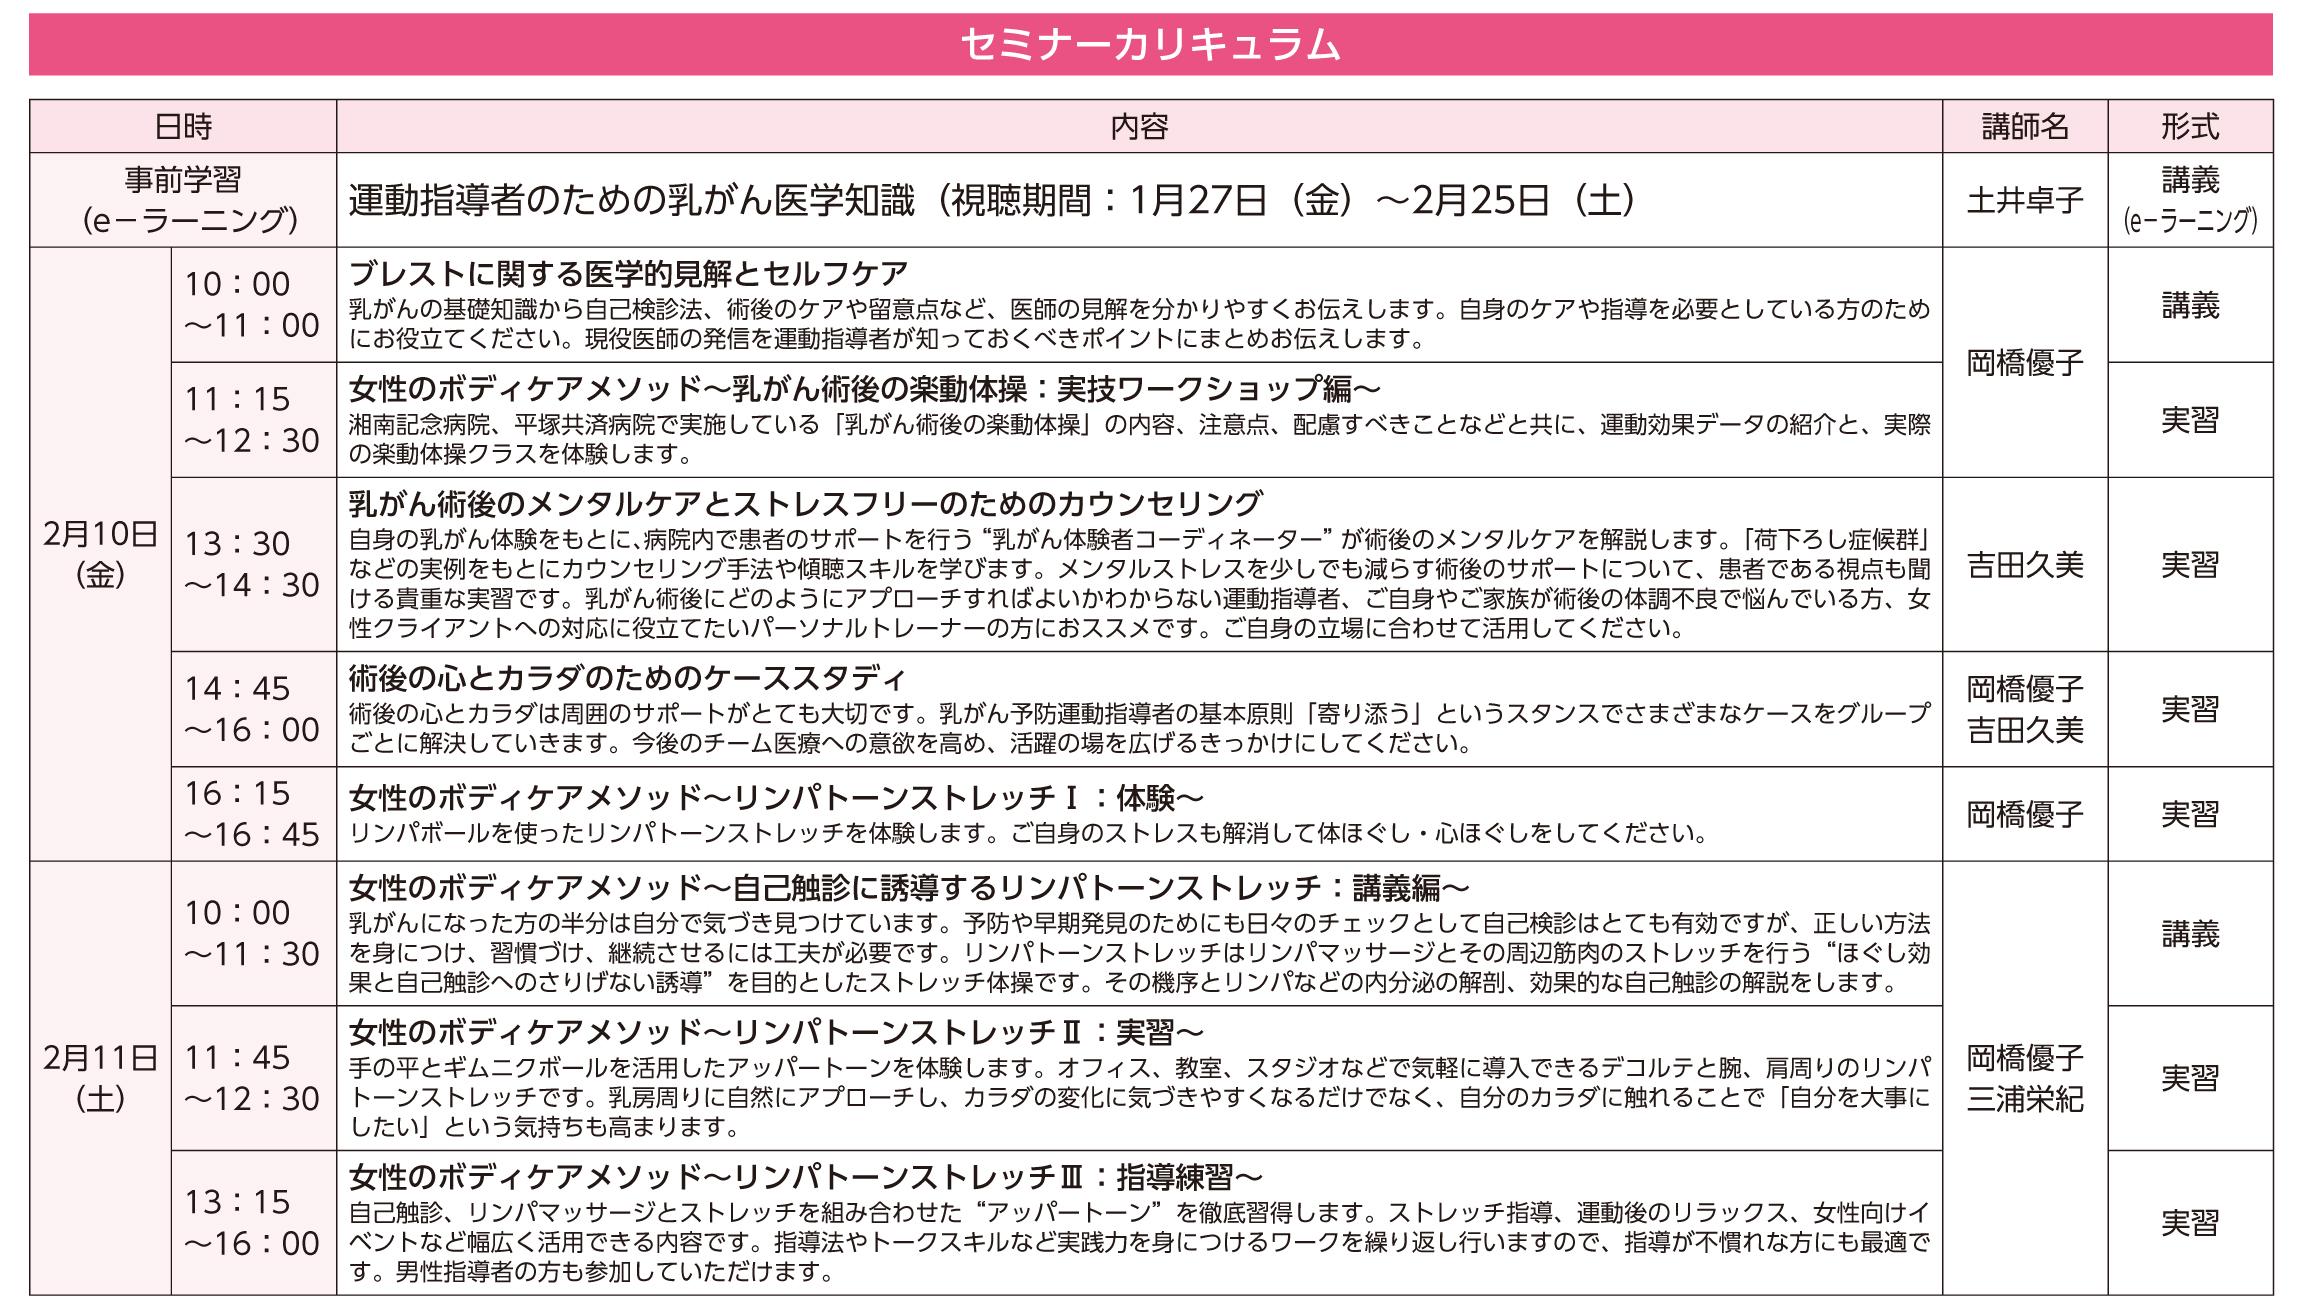 http://www.jafanet.jp/event/%E7%99%BB%E9%8C%B2%E6%9B%B4%E6%96%B0233%E3%82%B9%E3%82%B1%E3%82%B8%E3%83%A5%E3%83%BC%E3%83%AB.jpg